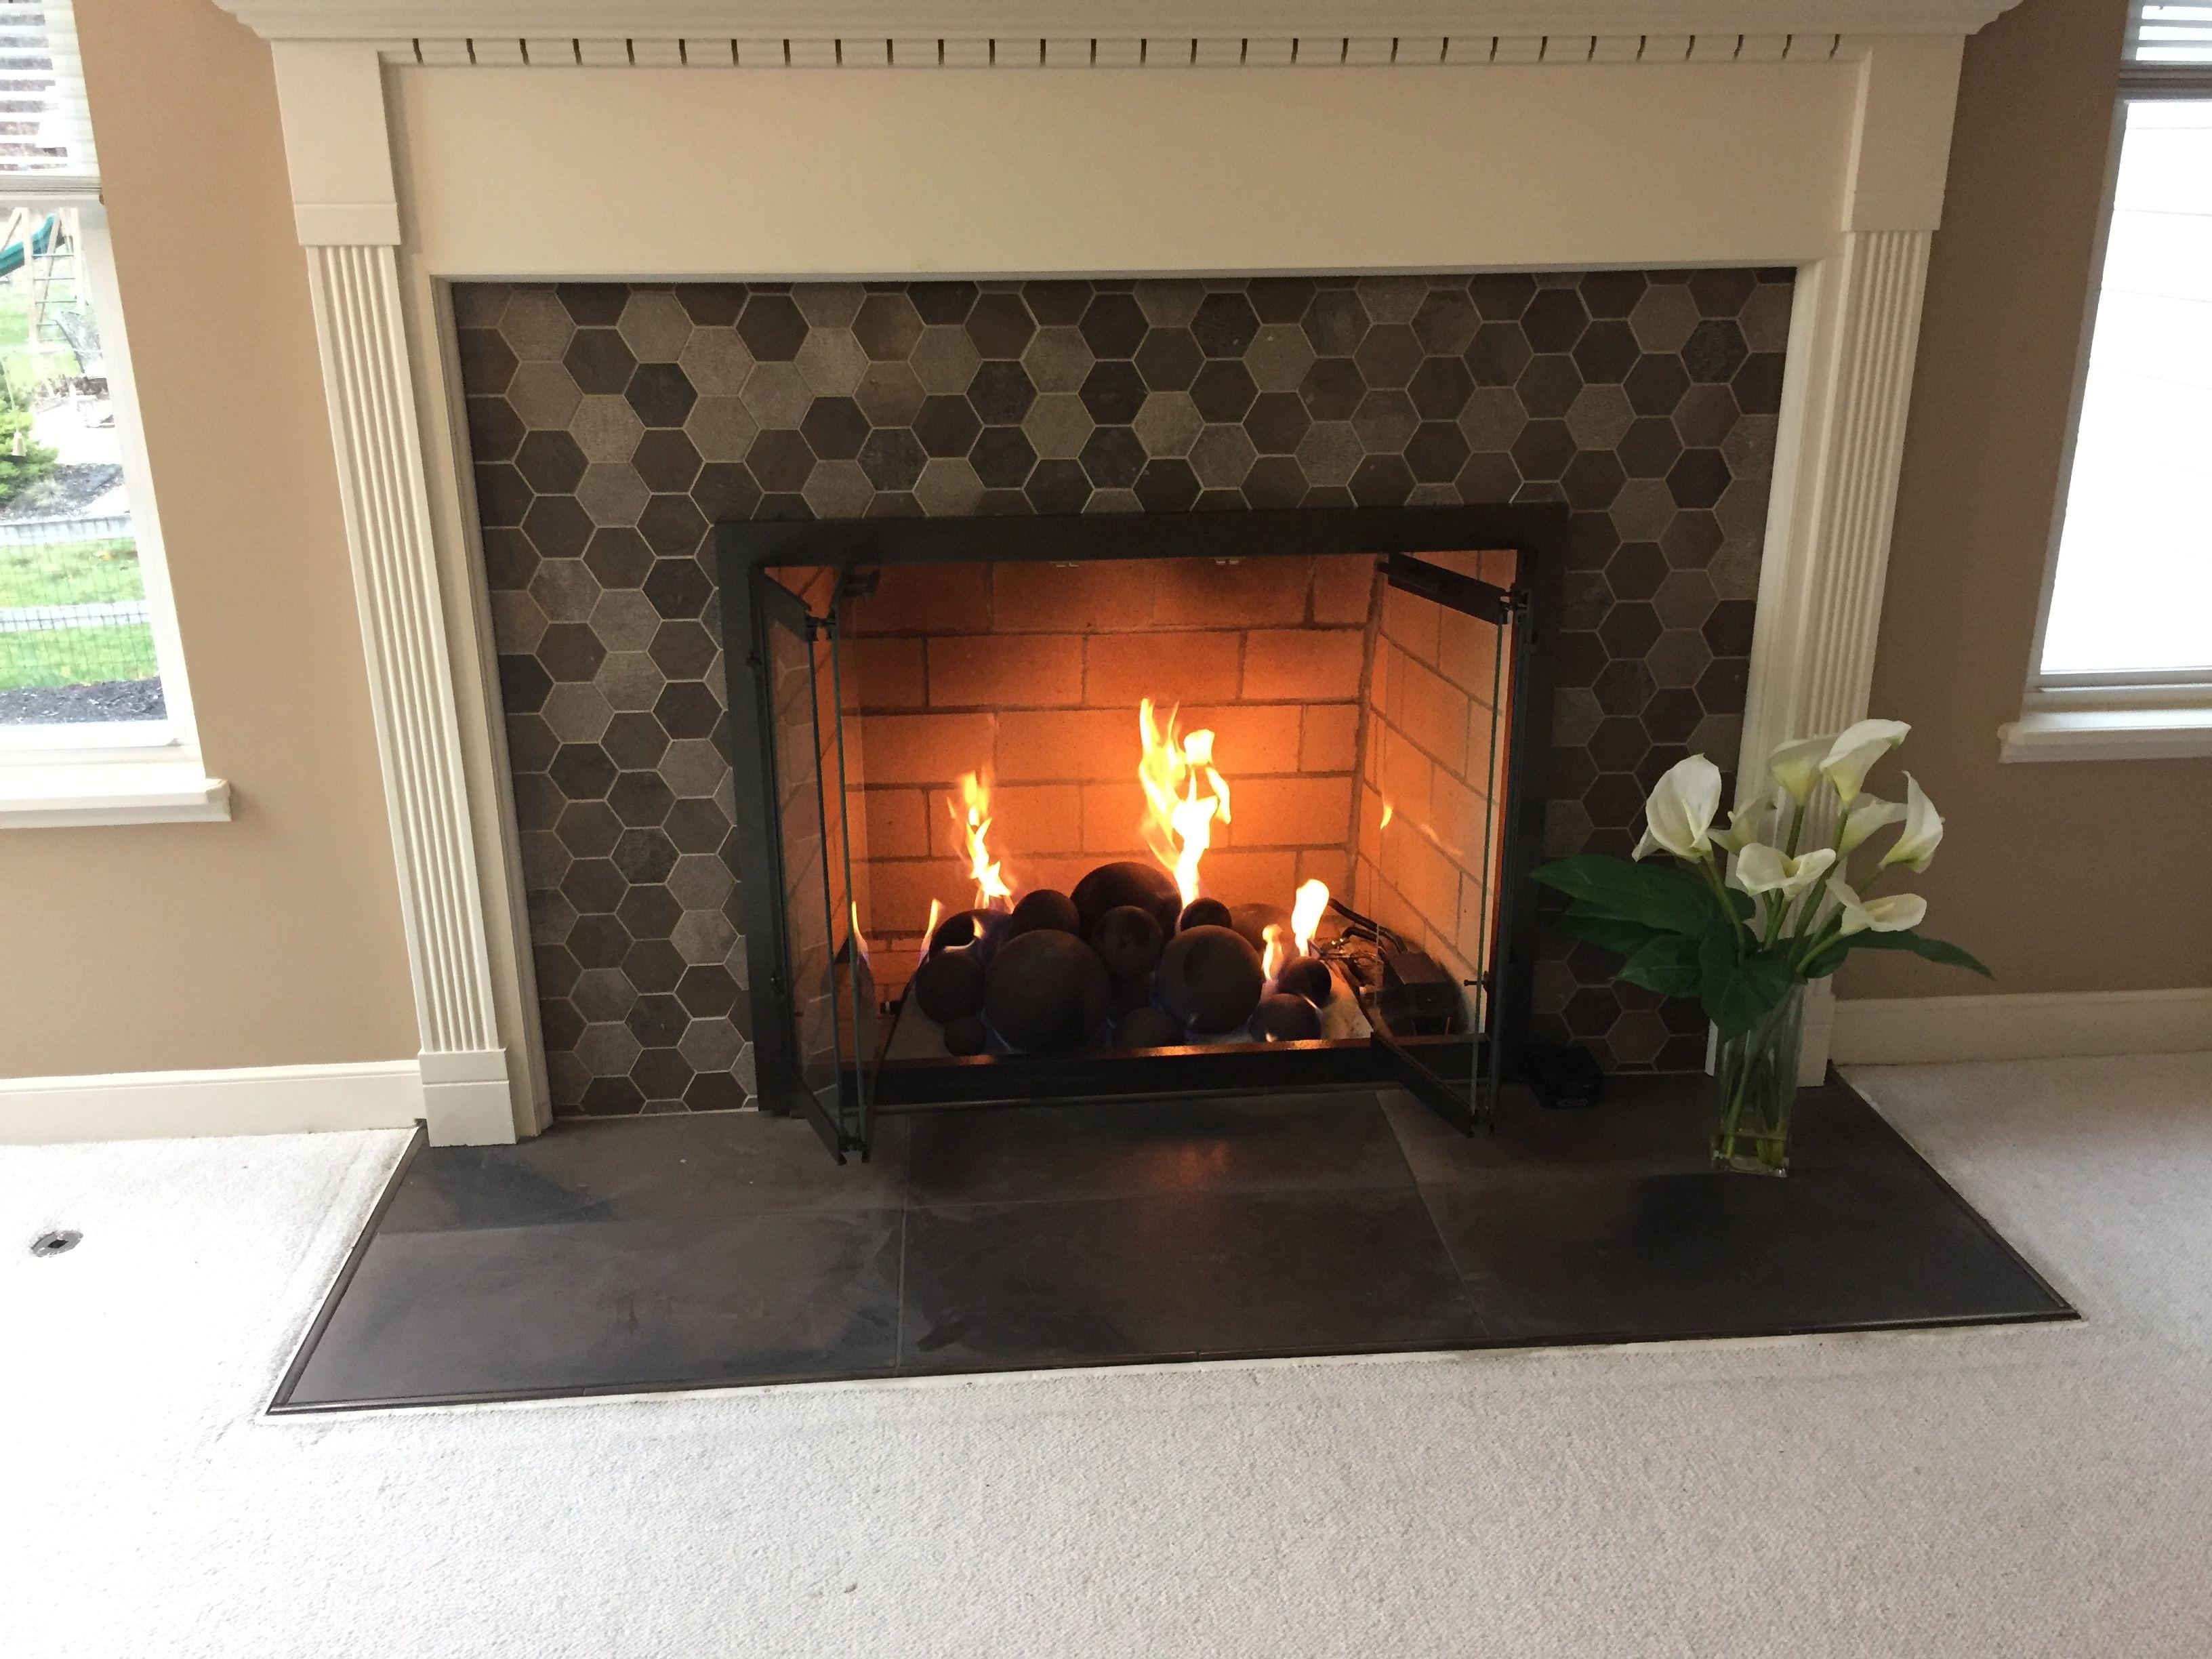 pin by roxanne amidon on new fire fireplace inserts fire home decor rh pinterest com